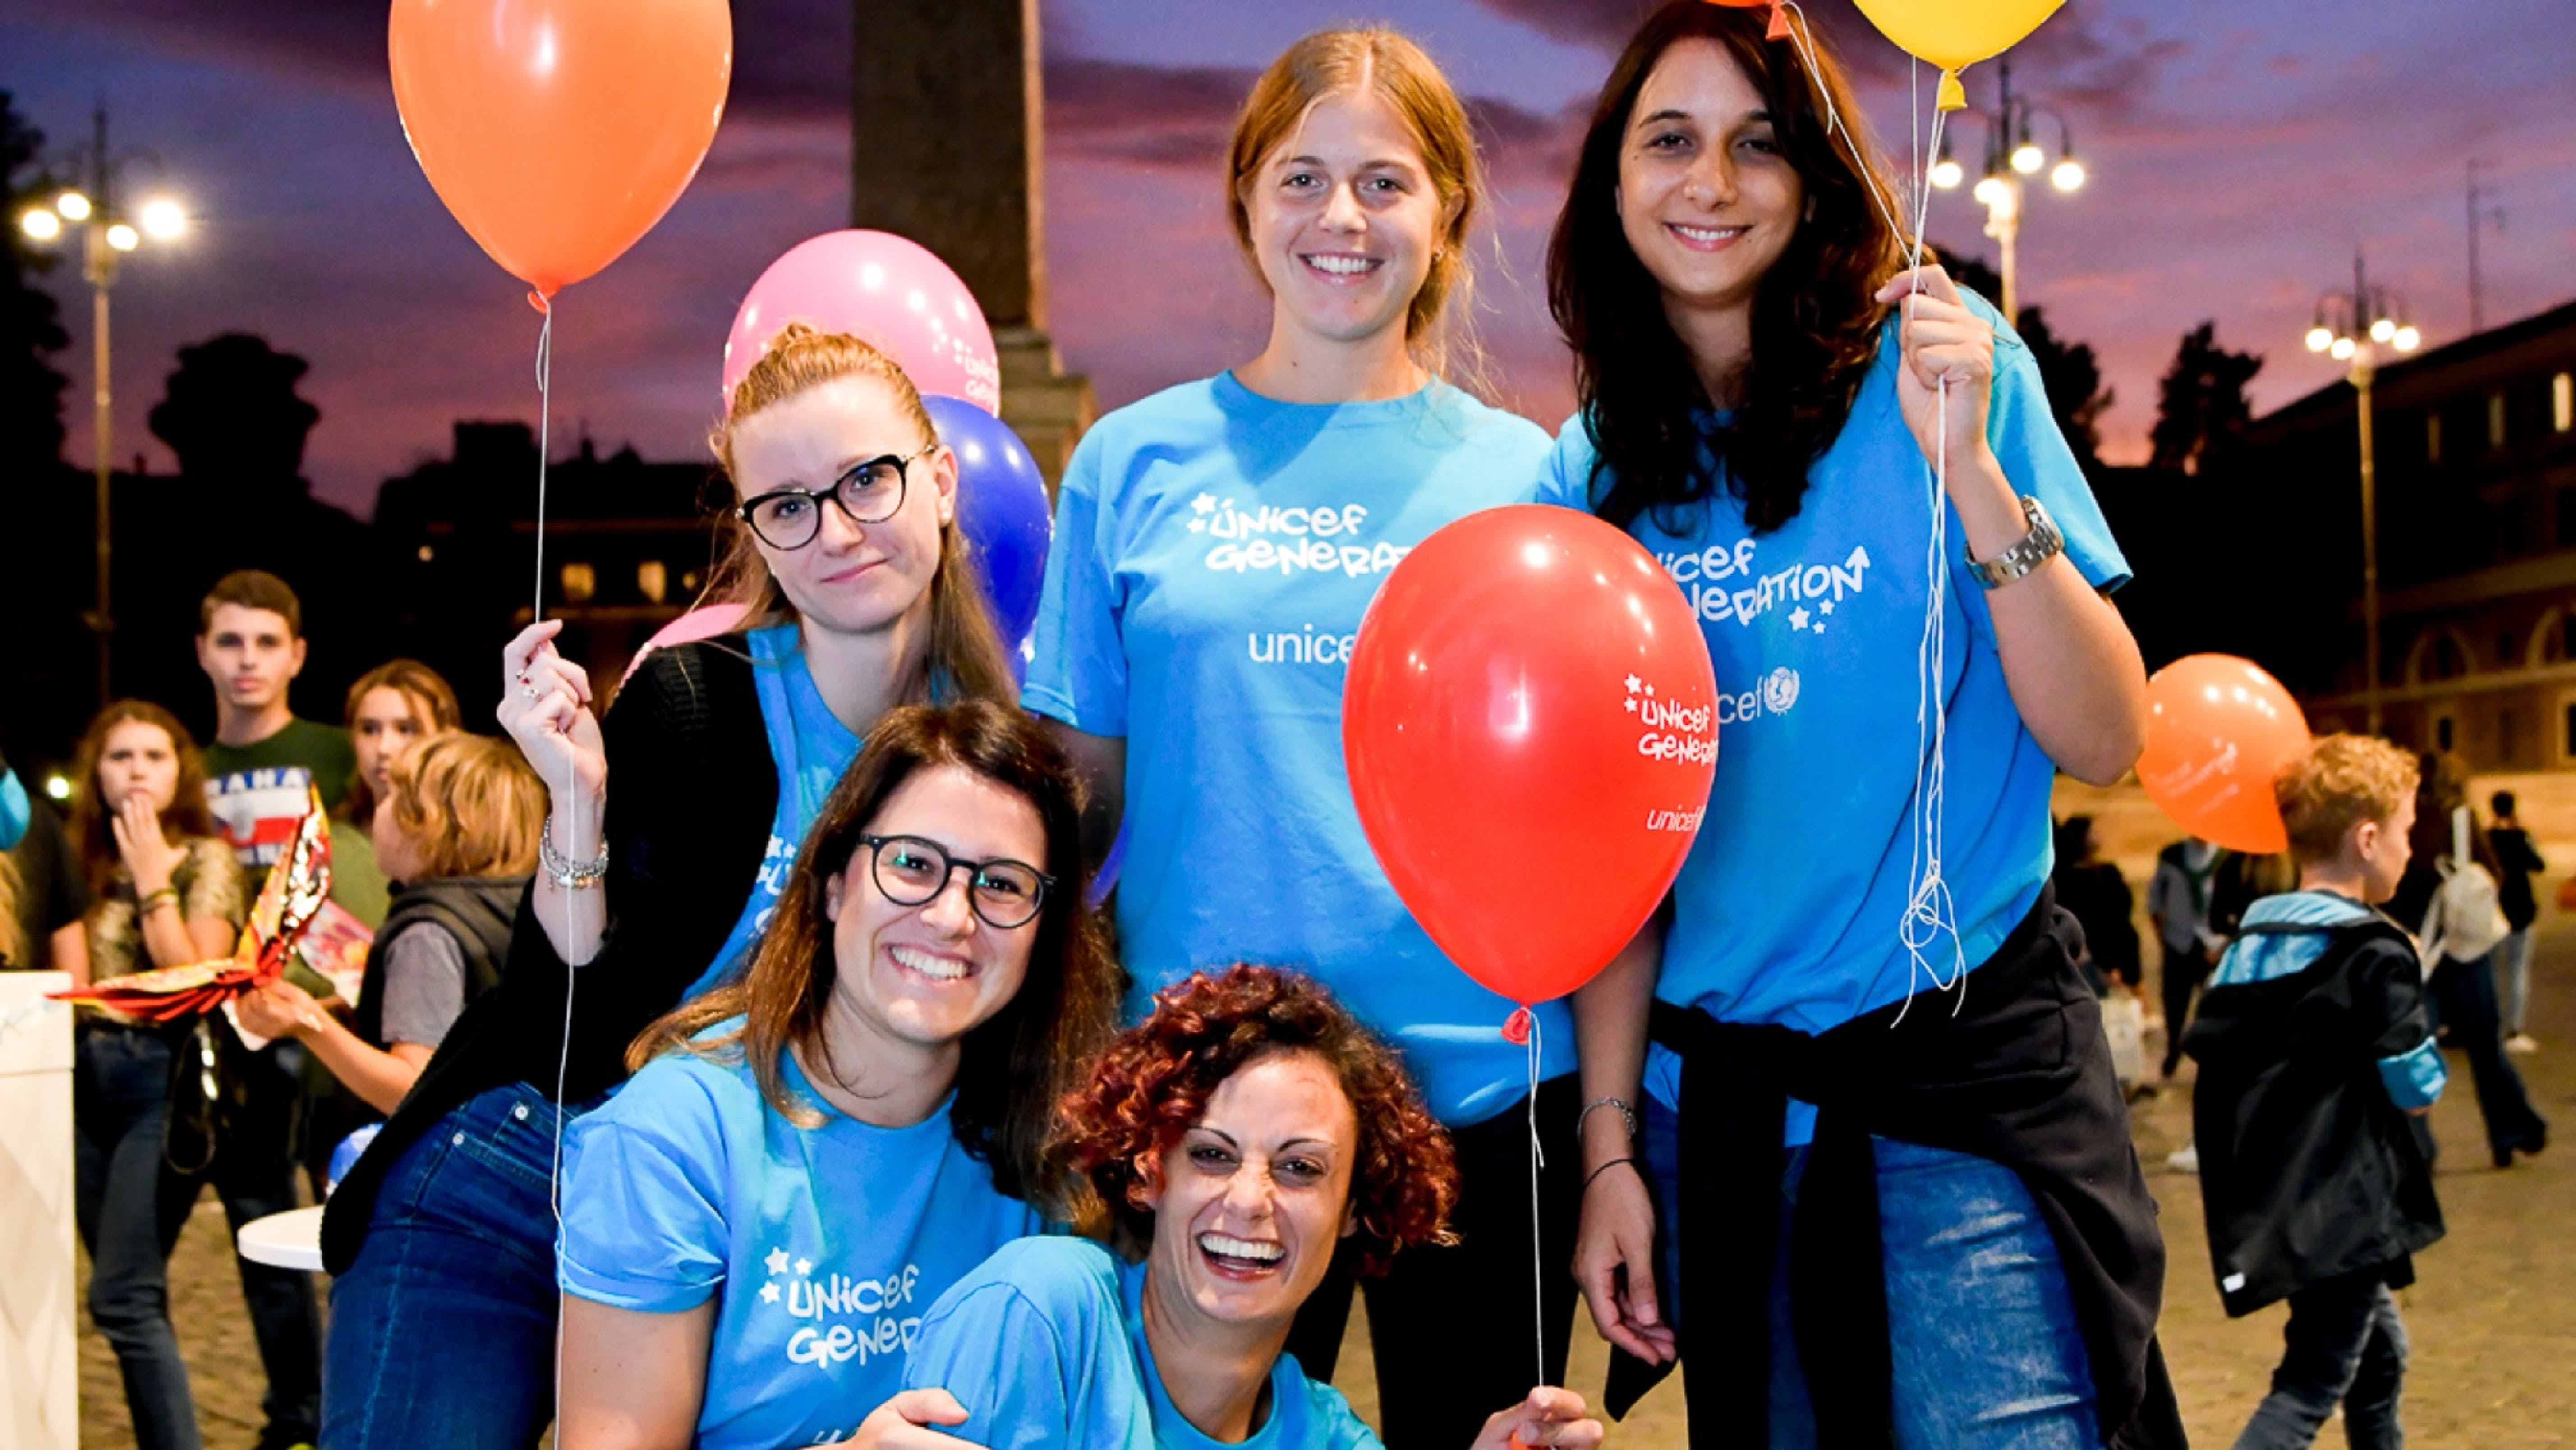 Volontari UNICEF Generation sorridono